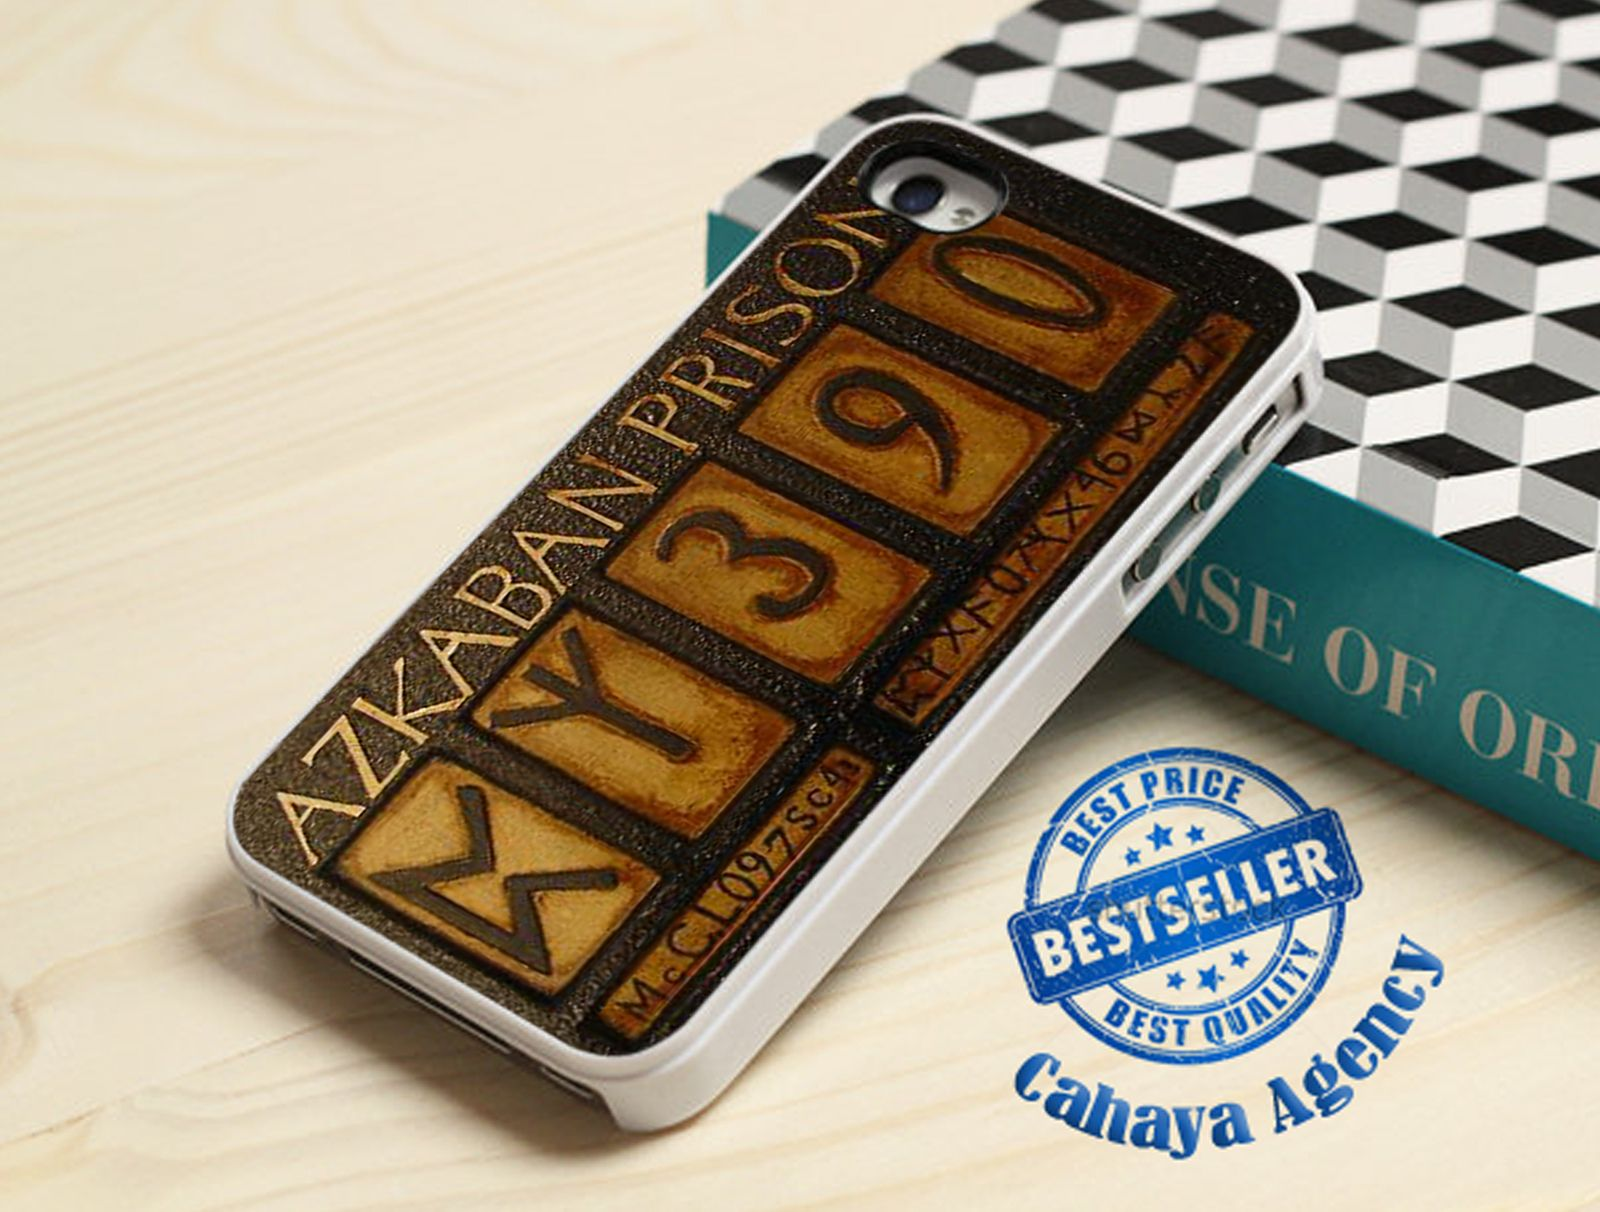 Harry Potter Azkaban iPhone 4,4s,5,5s,5c,6,6 plus,Samsung S3,S4,S5,iPod 4.5 Case